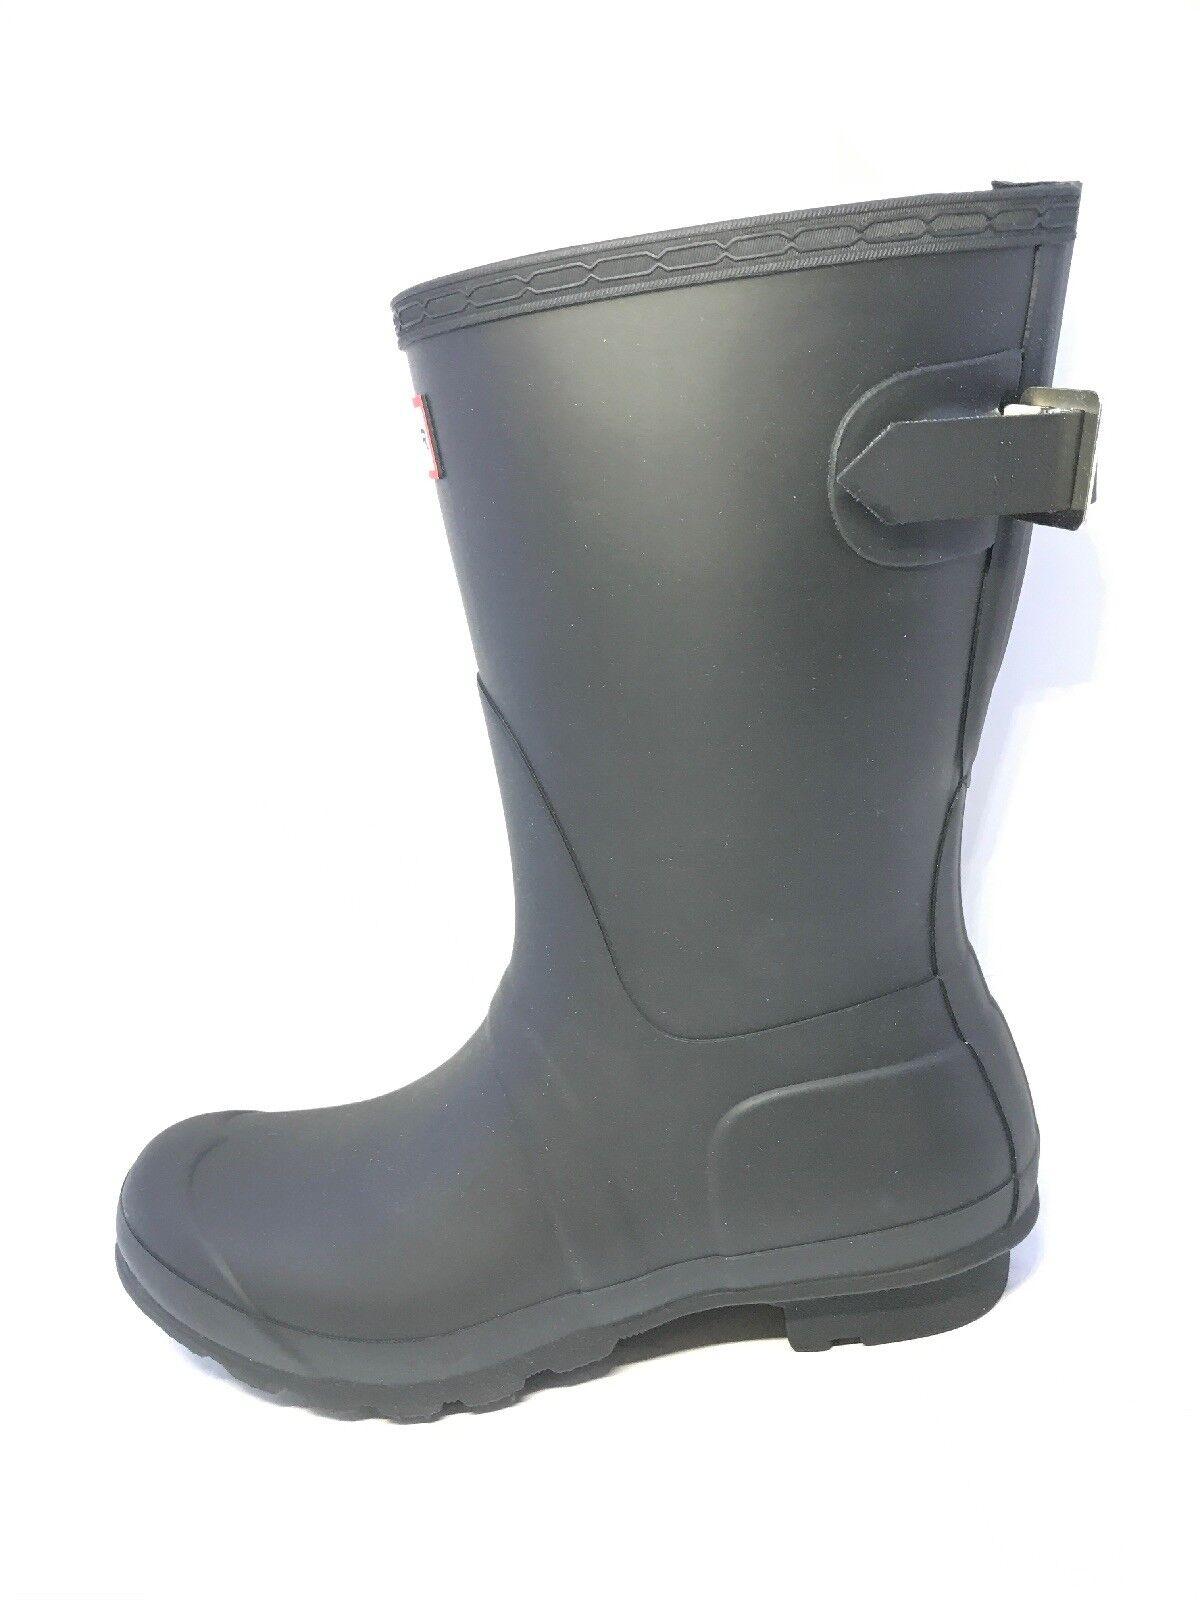 f331e73049d Para botas Wellington Ajustable Original De Corto negro Talla Trasero mujer  ntyxkb3766-Botas